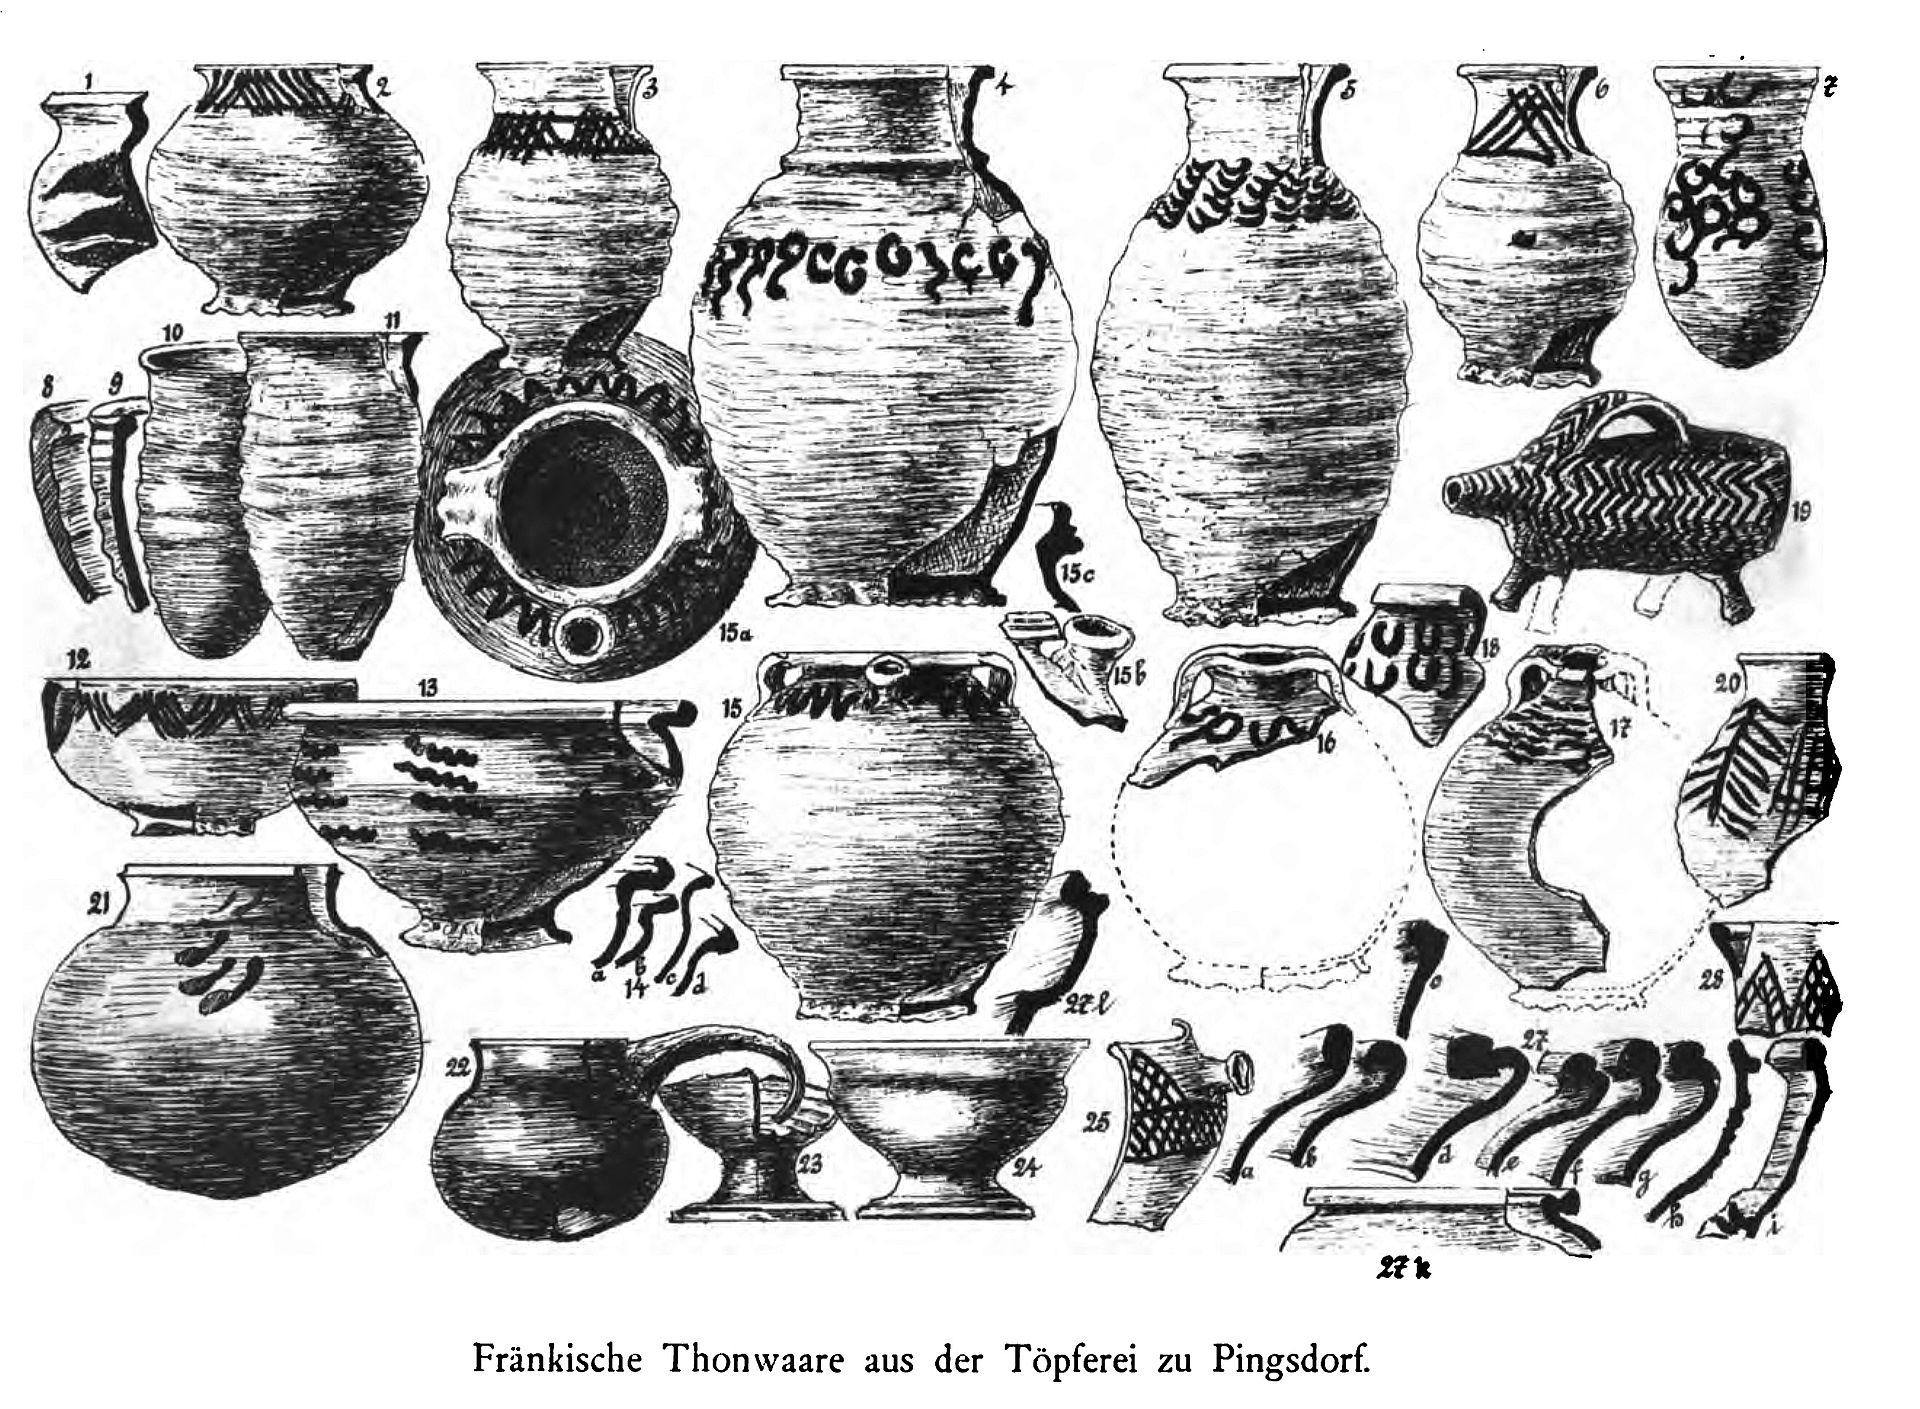 pingsdorfer keramik wikipedia. Black Bedroom Furniture Sets. Home Design Ideas